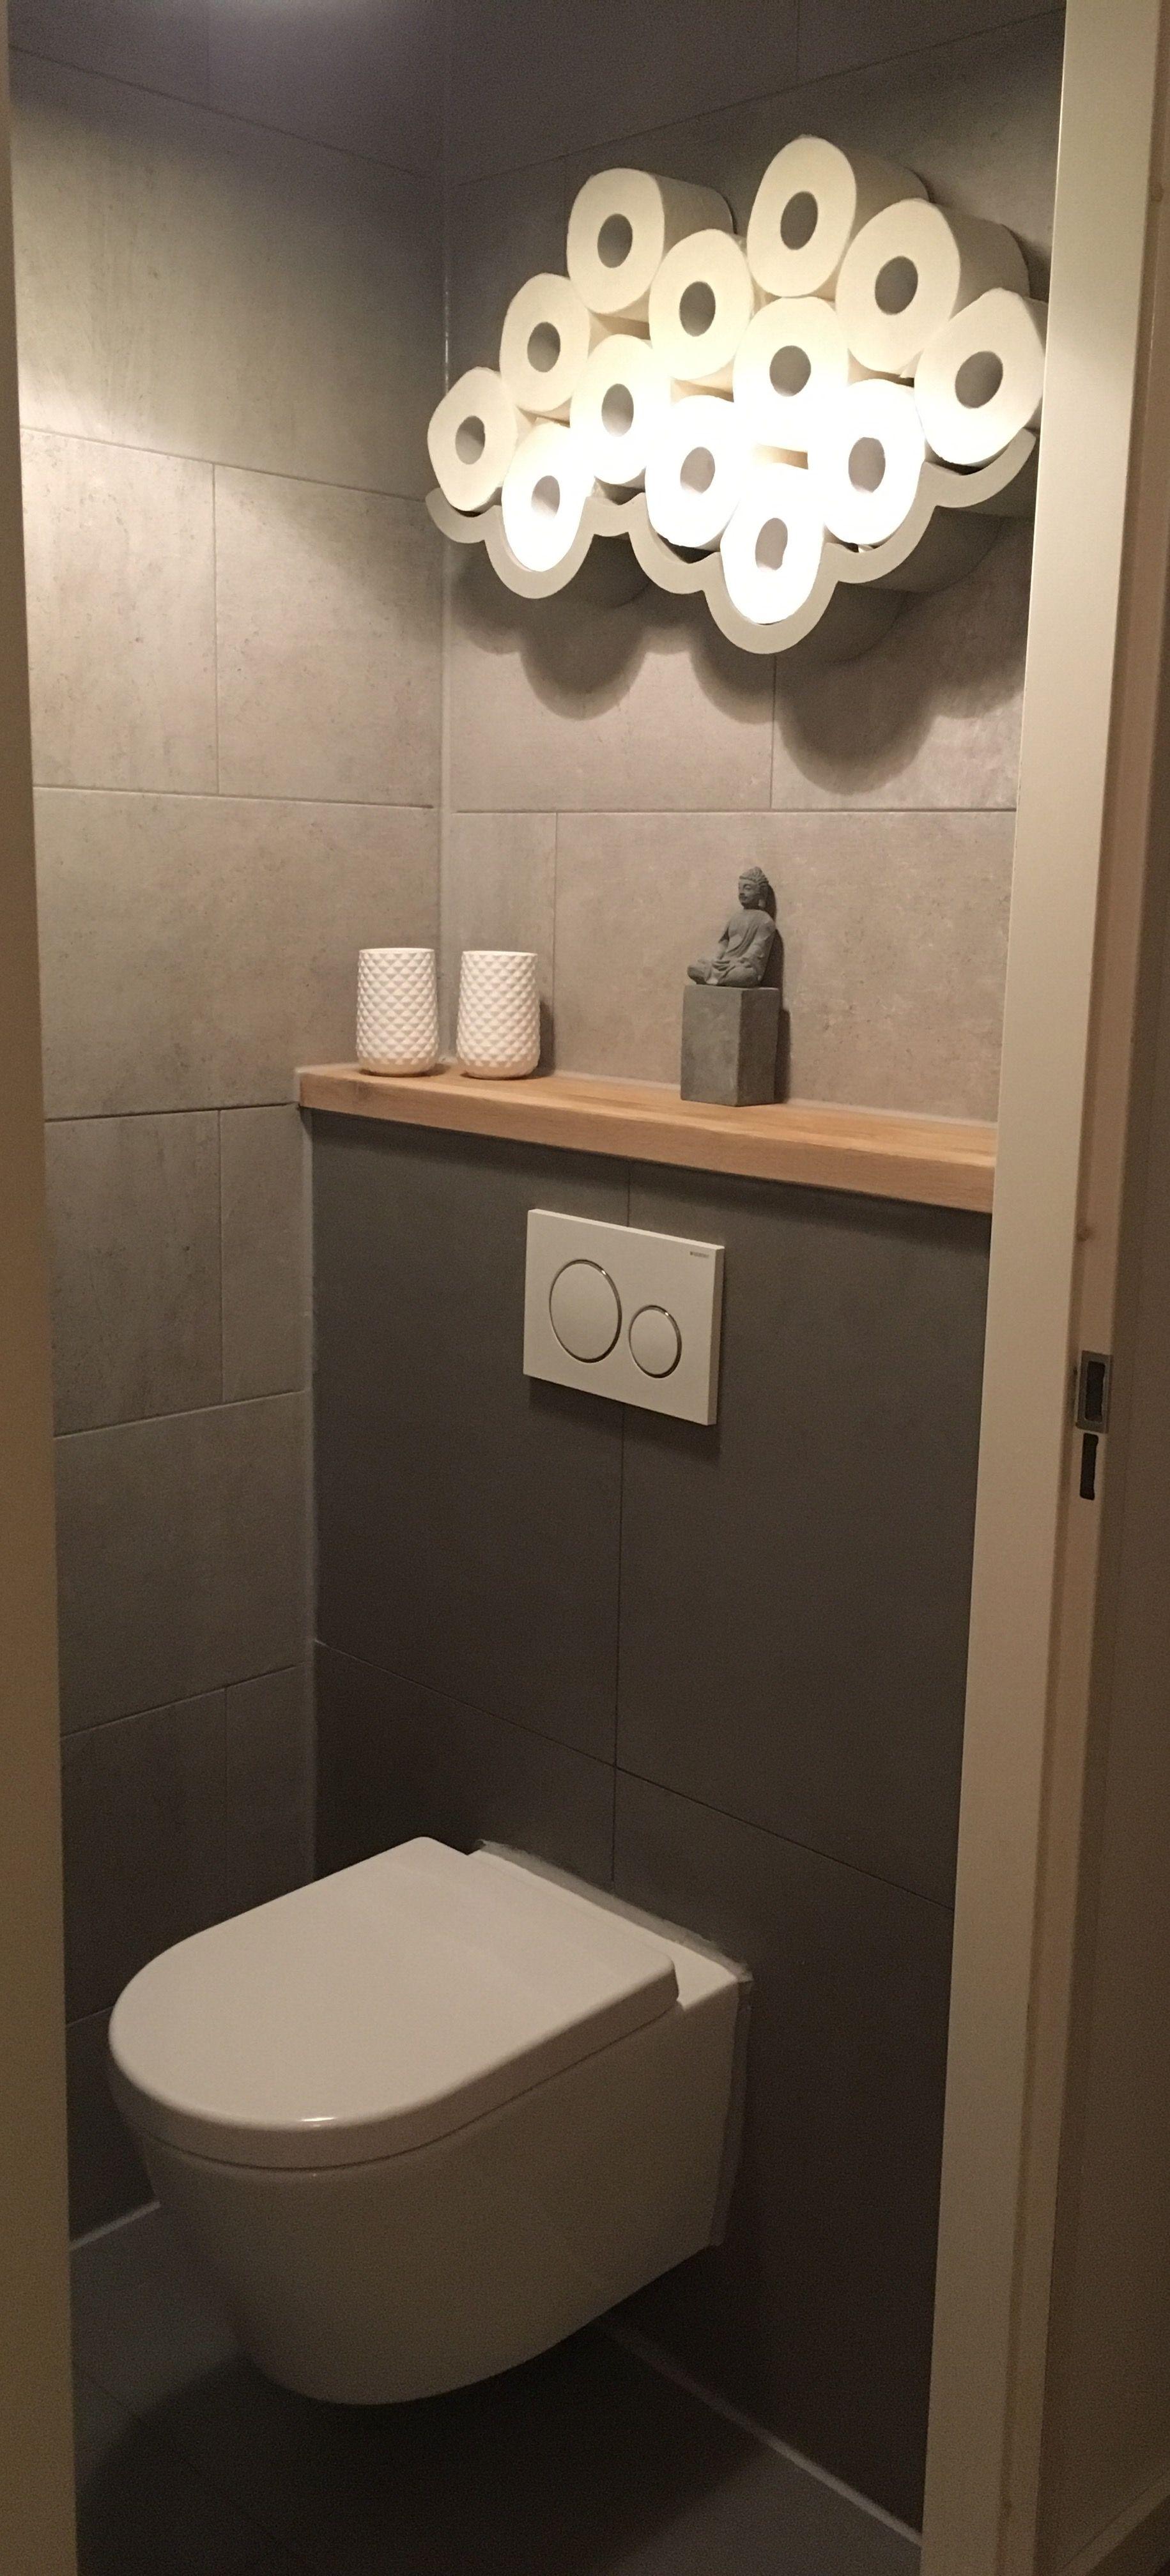 Betonlook Tegels Met Geberit Toilet Avec Images Deco Toilettes Idee Deco Toilettes Relooking Toilettes